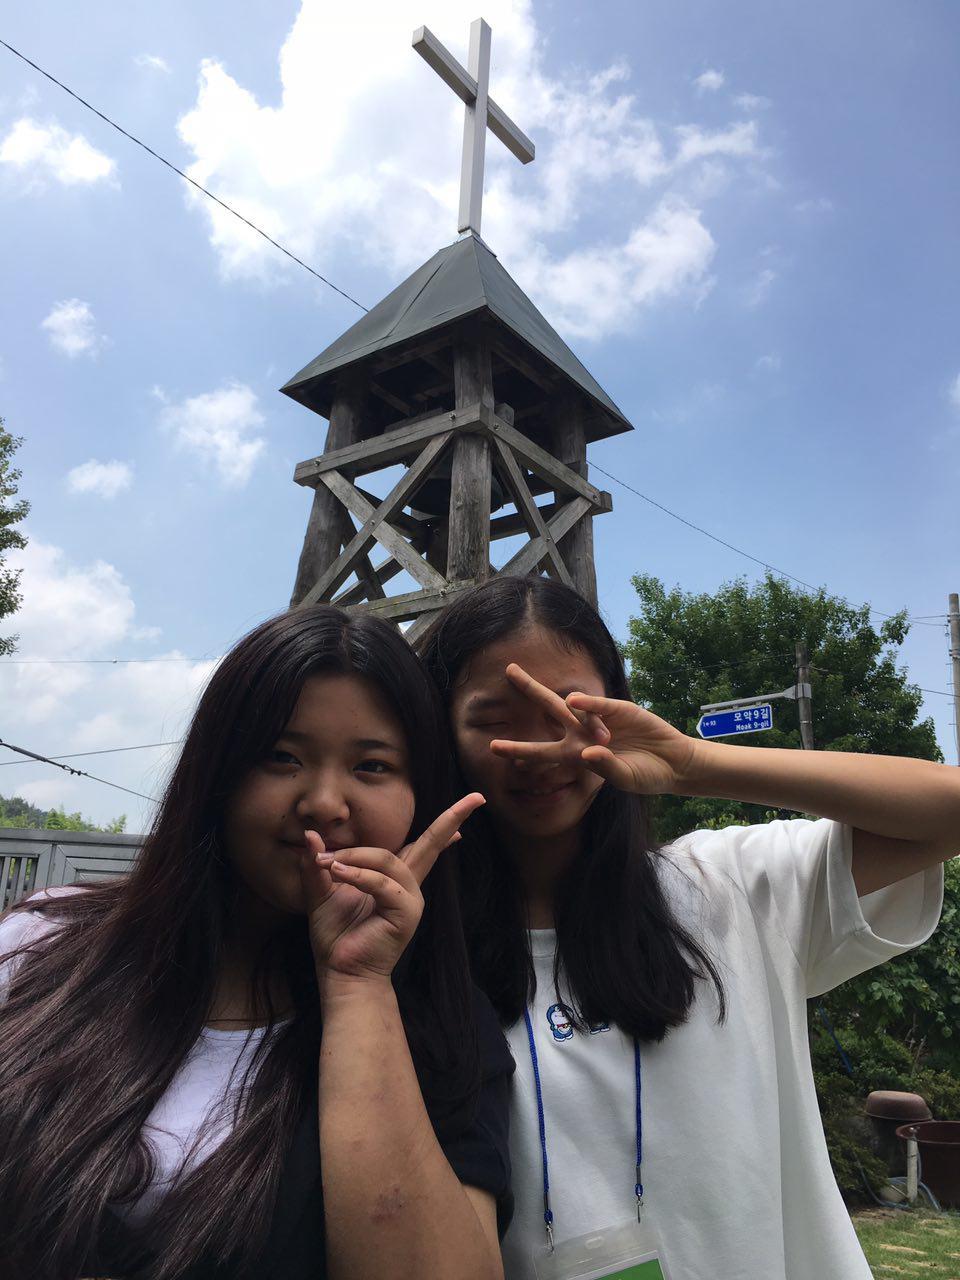 photo_2016-08-13_14-15-33.jpg